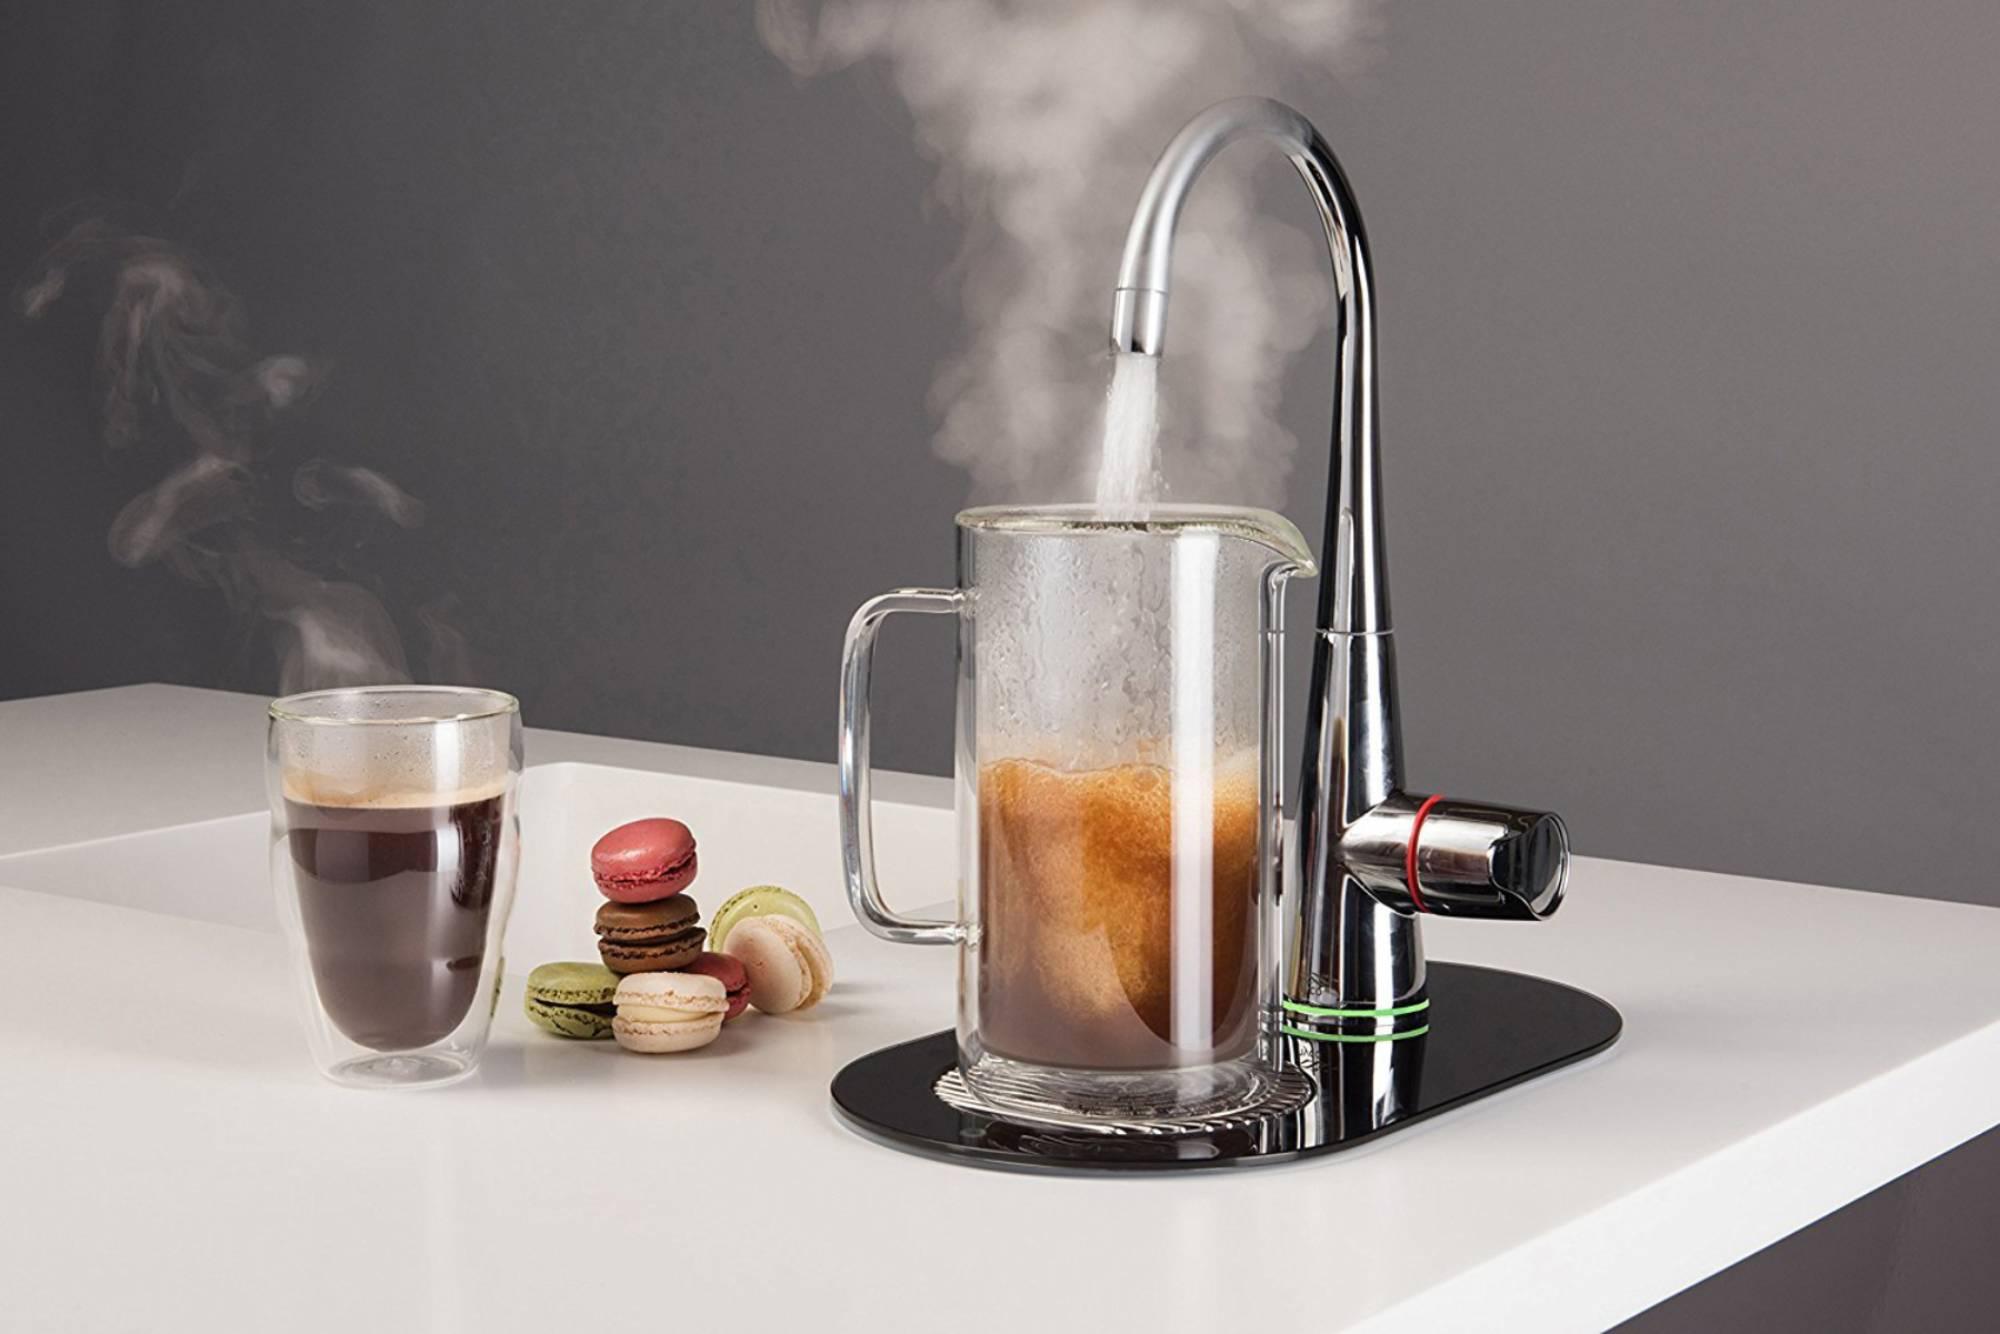 Beste kokend water kraan tips; het populairste keukenaccessoire van dit jaar